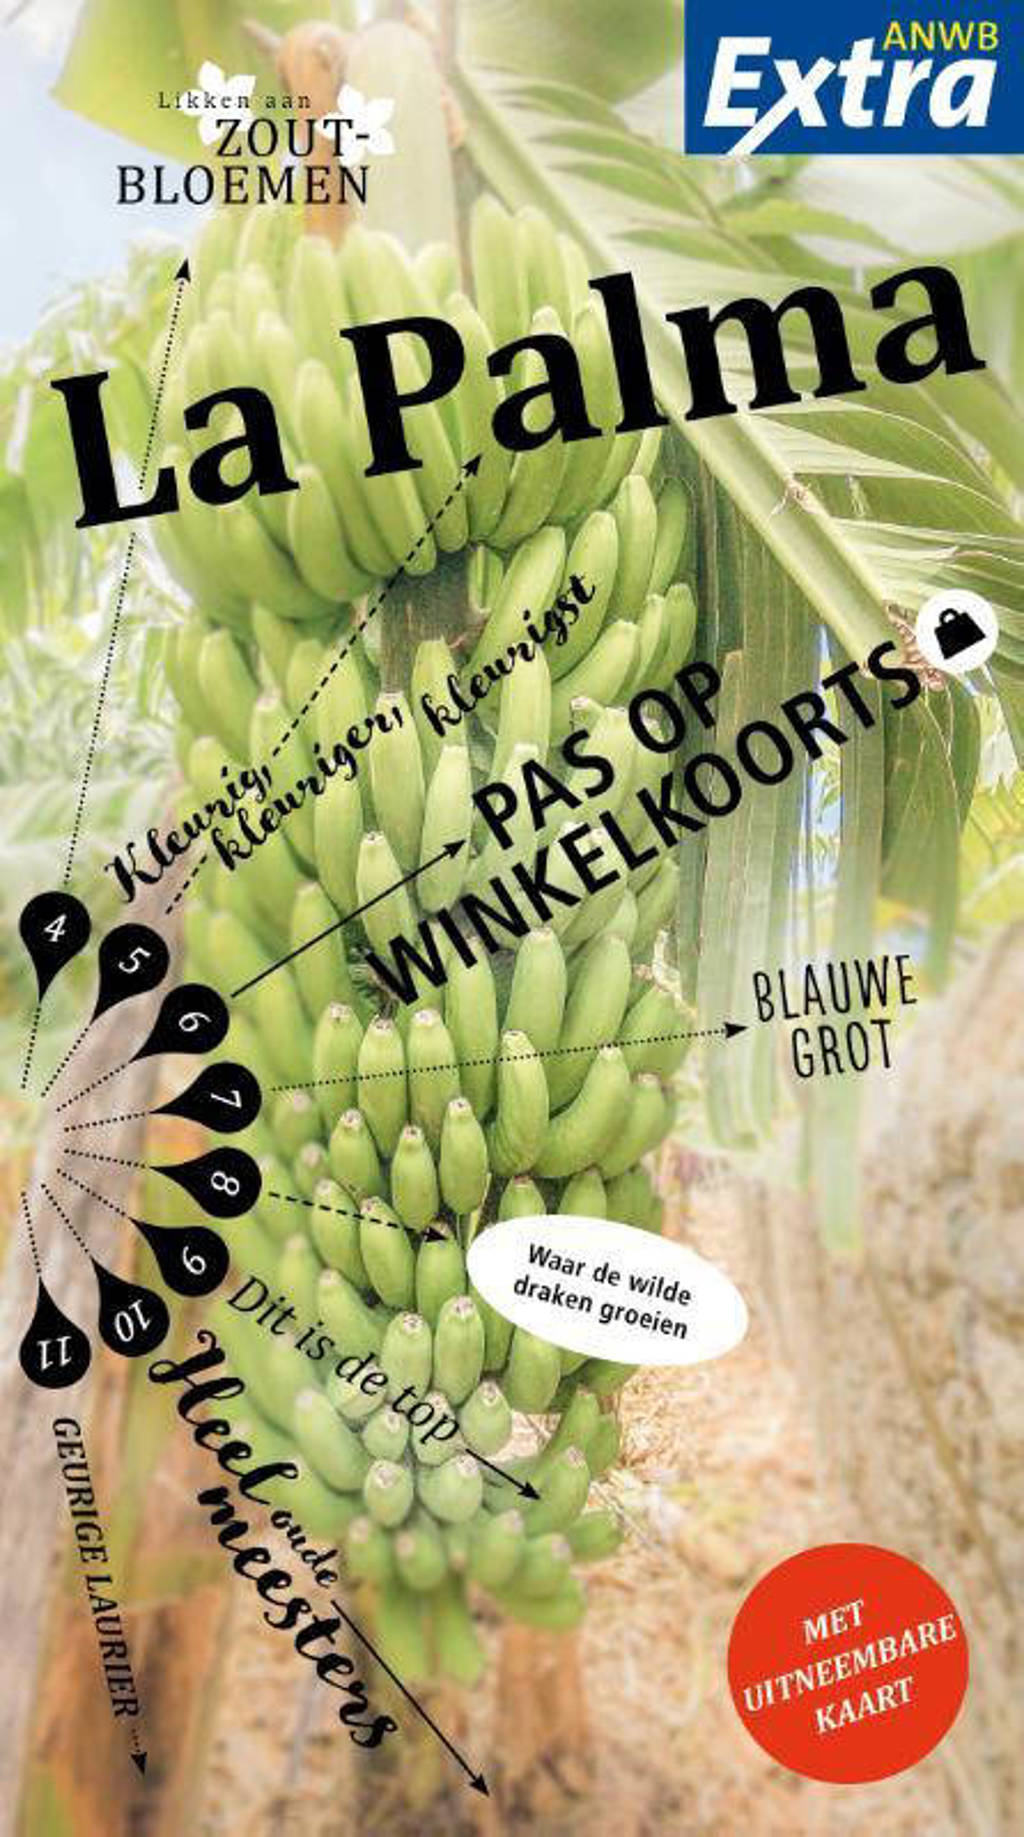 ANWB Extra: La Palma - Dieter Schulze